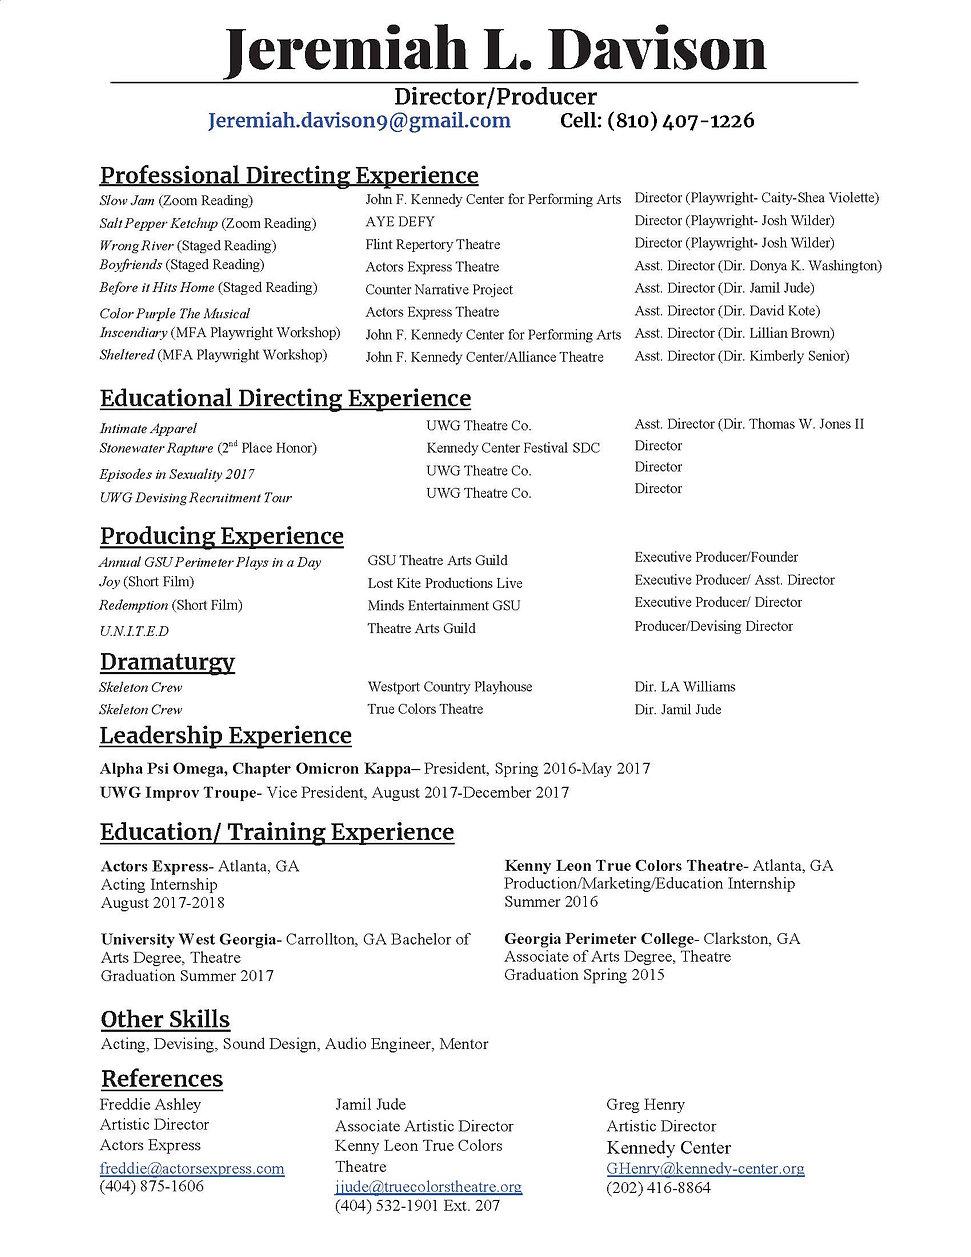 Jeremiah Davison Directing Resume.jpg